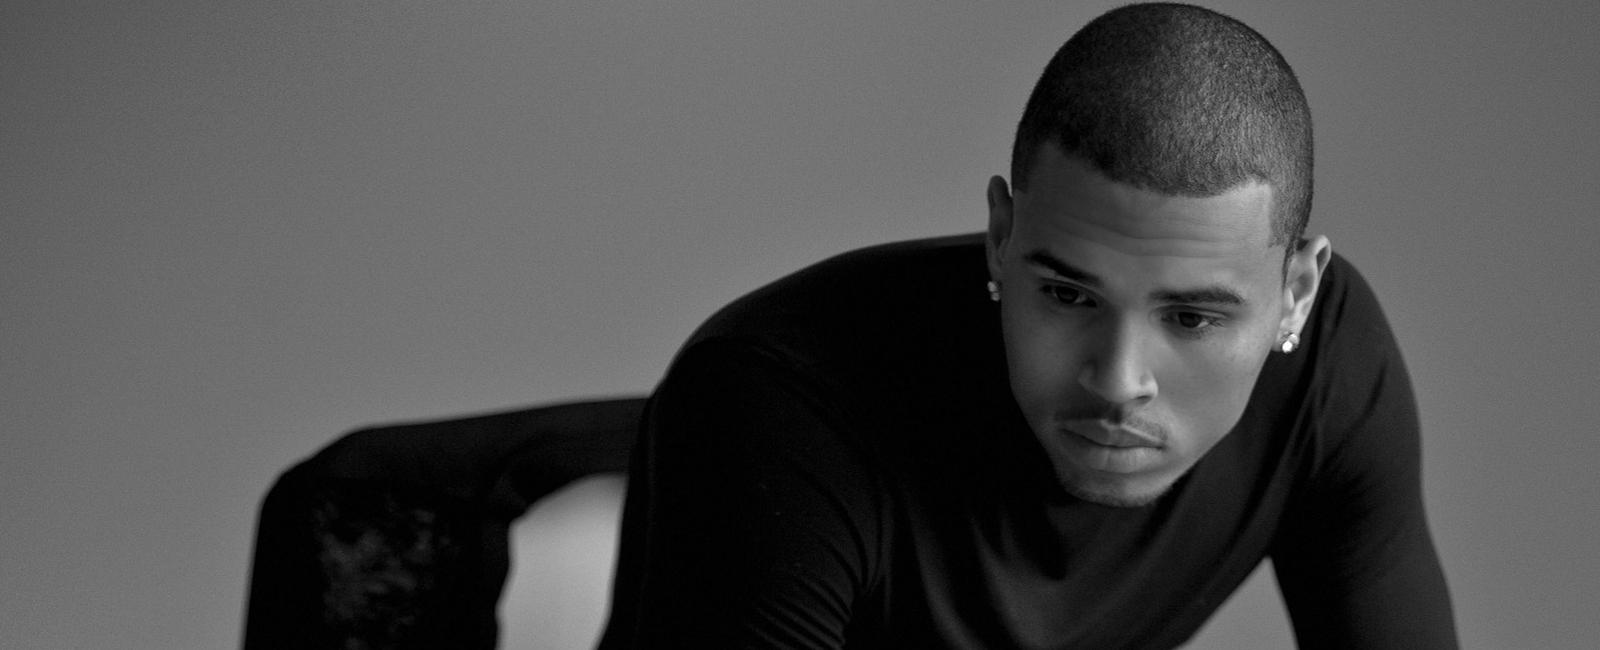 Chris Brown – New Flame ft. Usher & Rick Ross